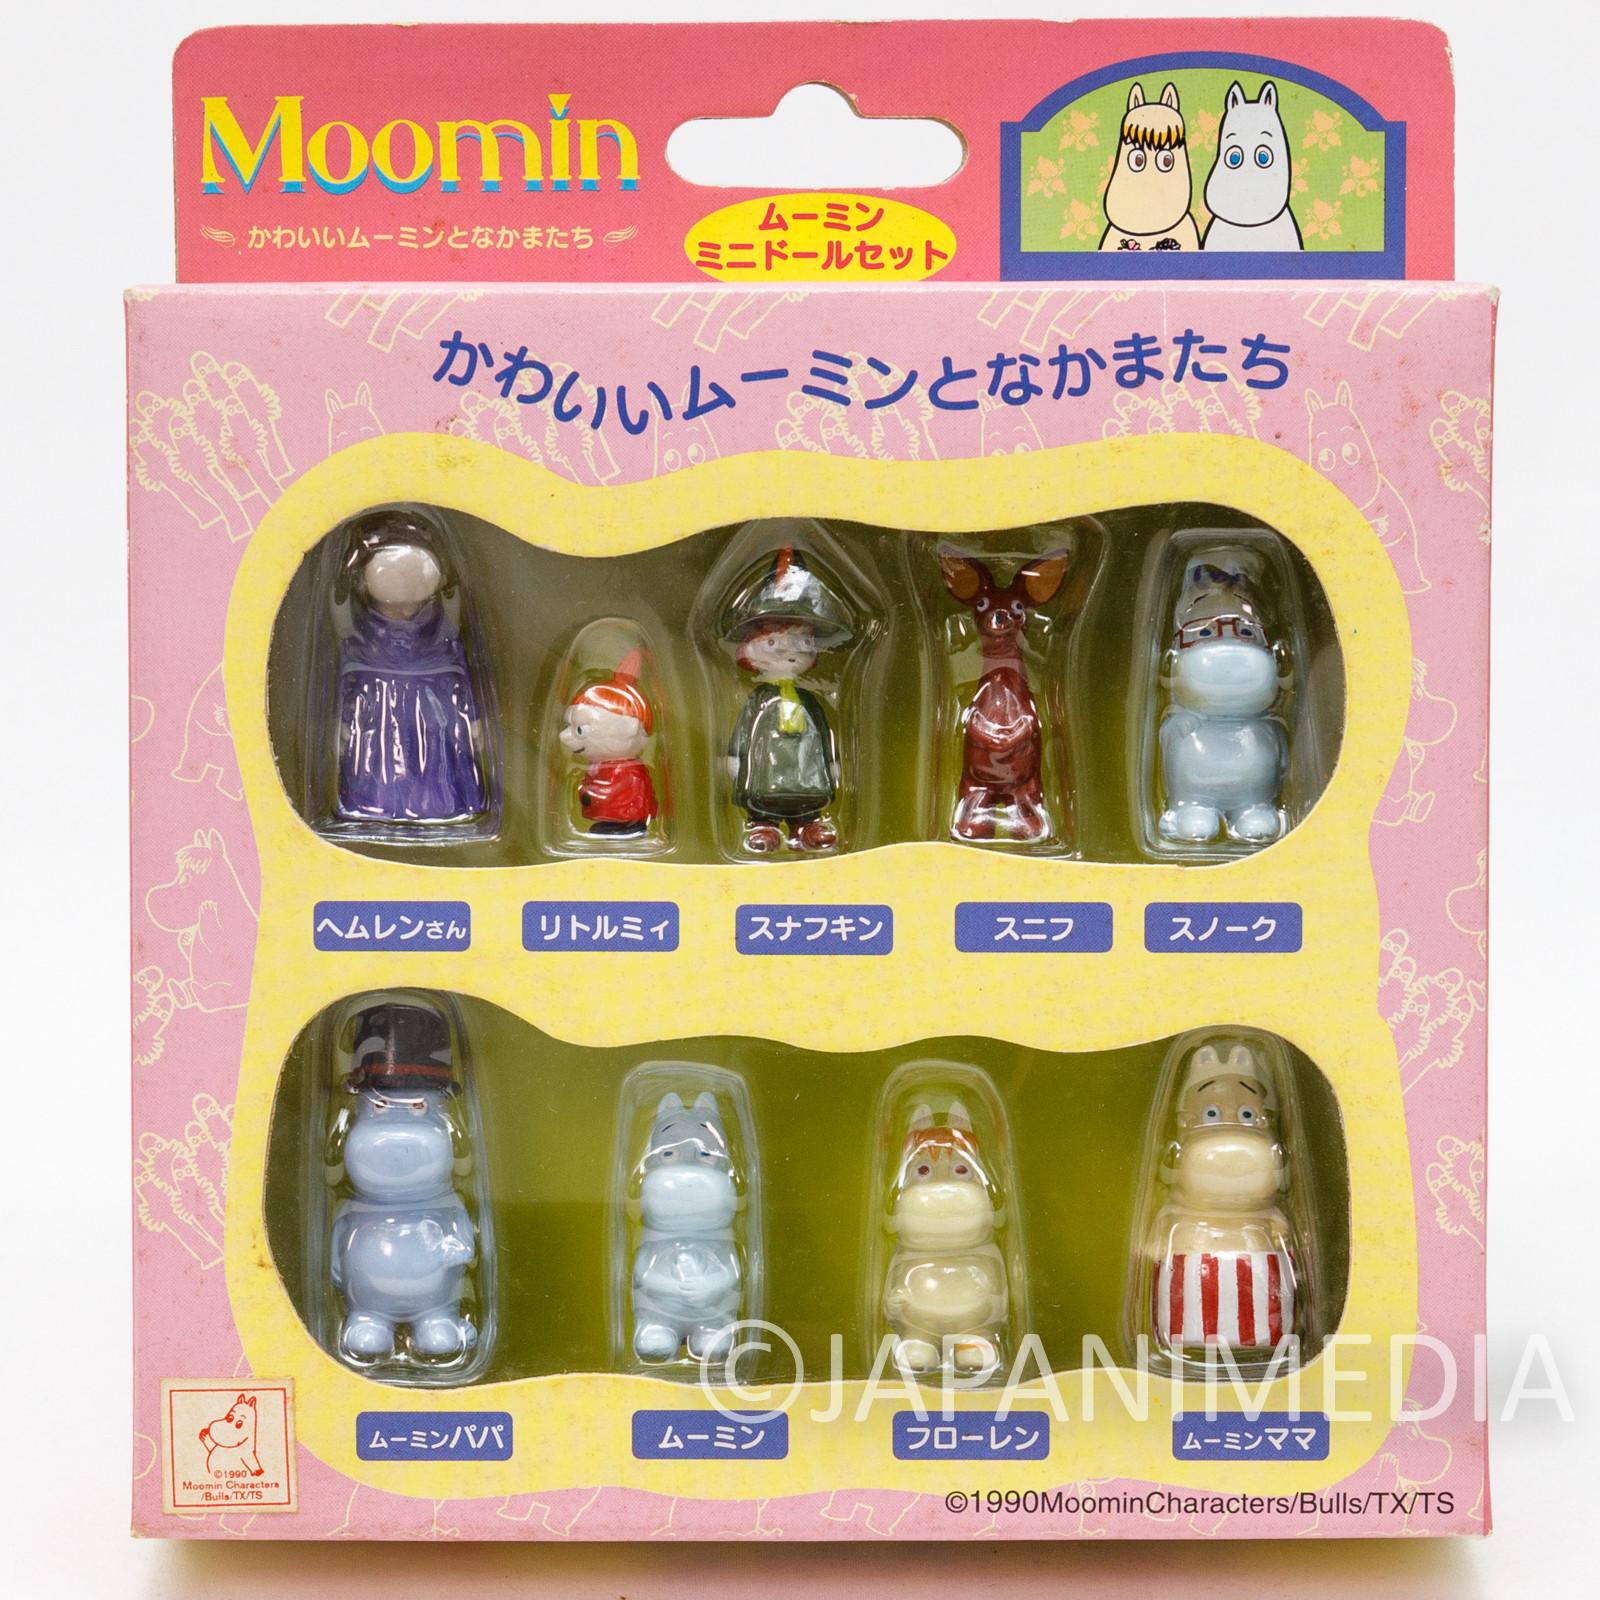 RARE Moomin Characters Miniature Figure Mini Doll 9pc Set Sunlike JAPAN